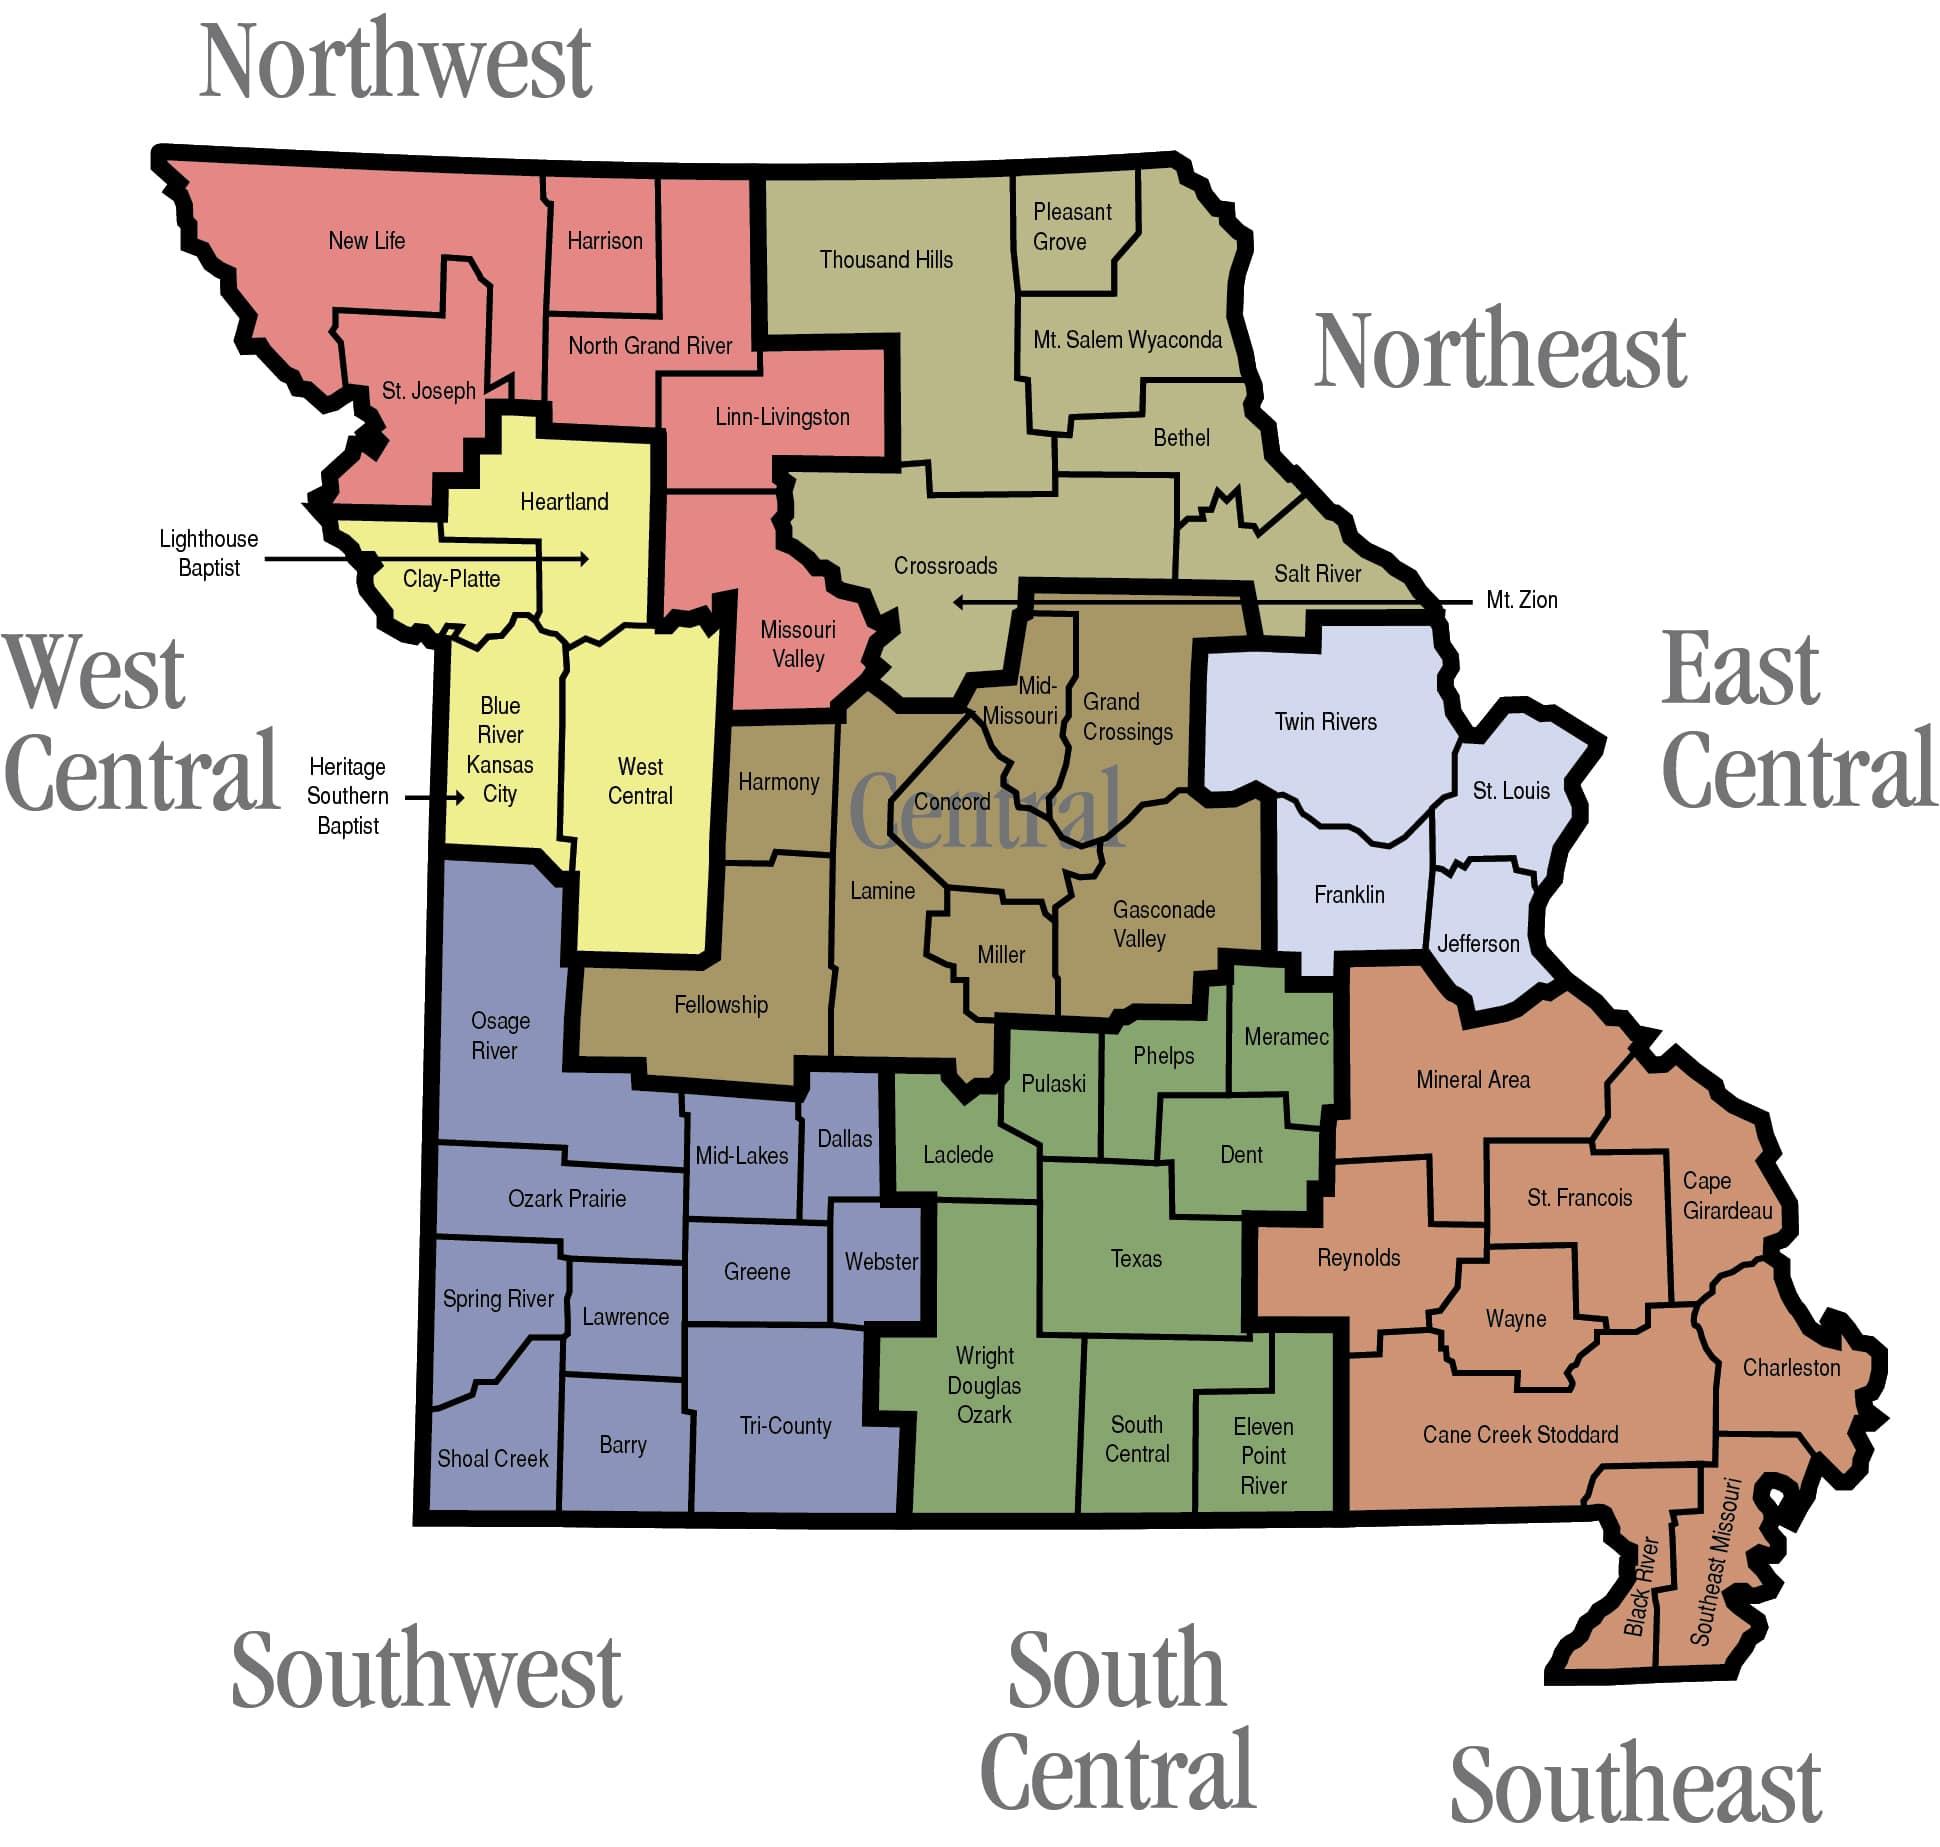 https://mobaptist.org/wp-content/uploads/2018/04/mbc-regions-associations.jpg